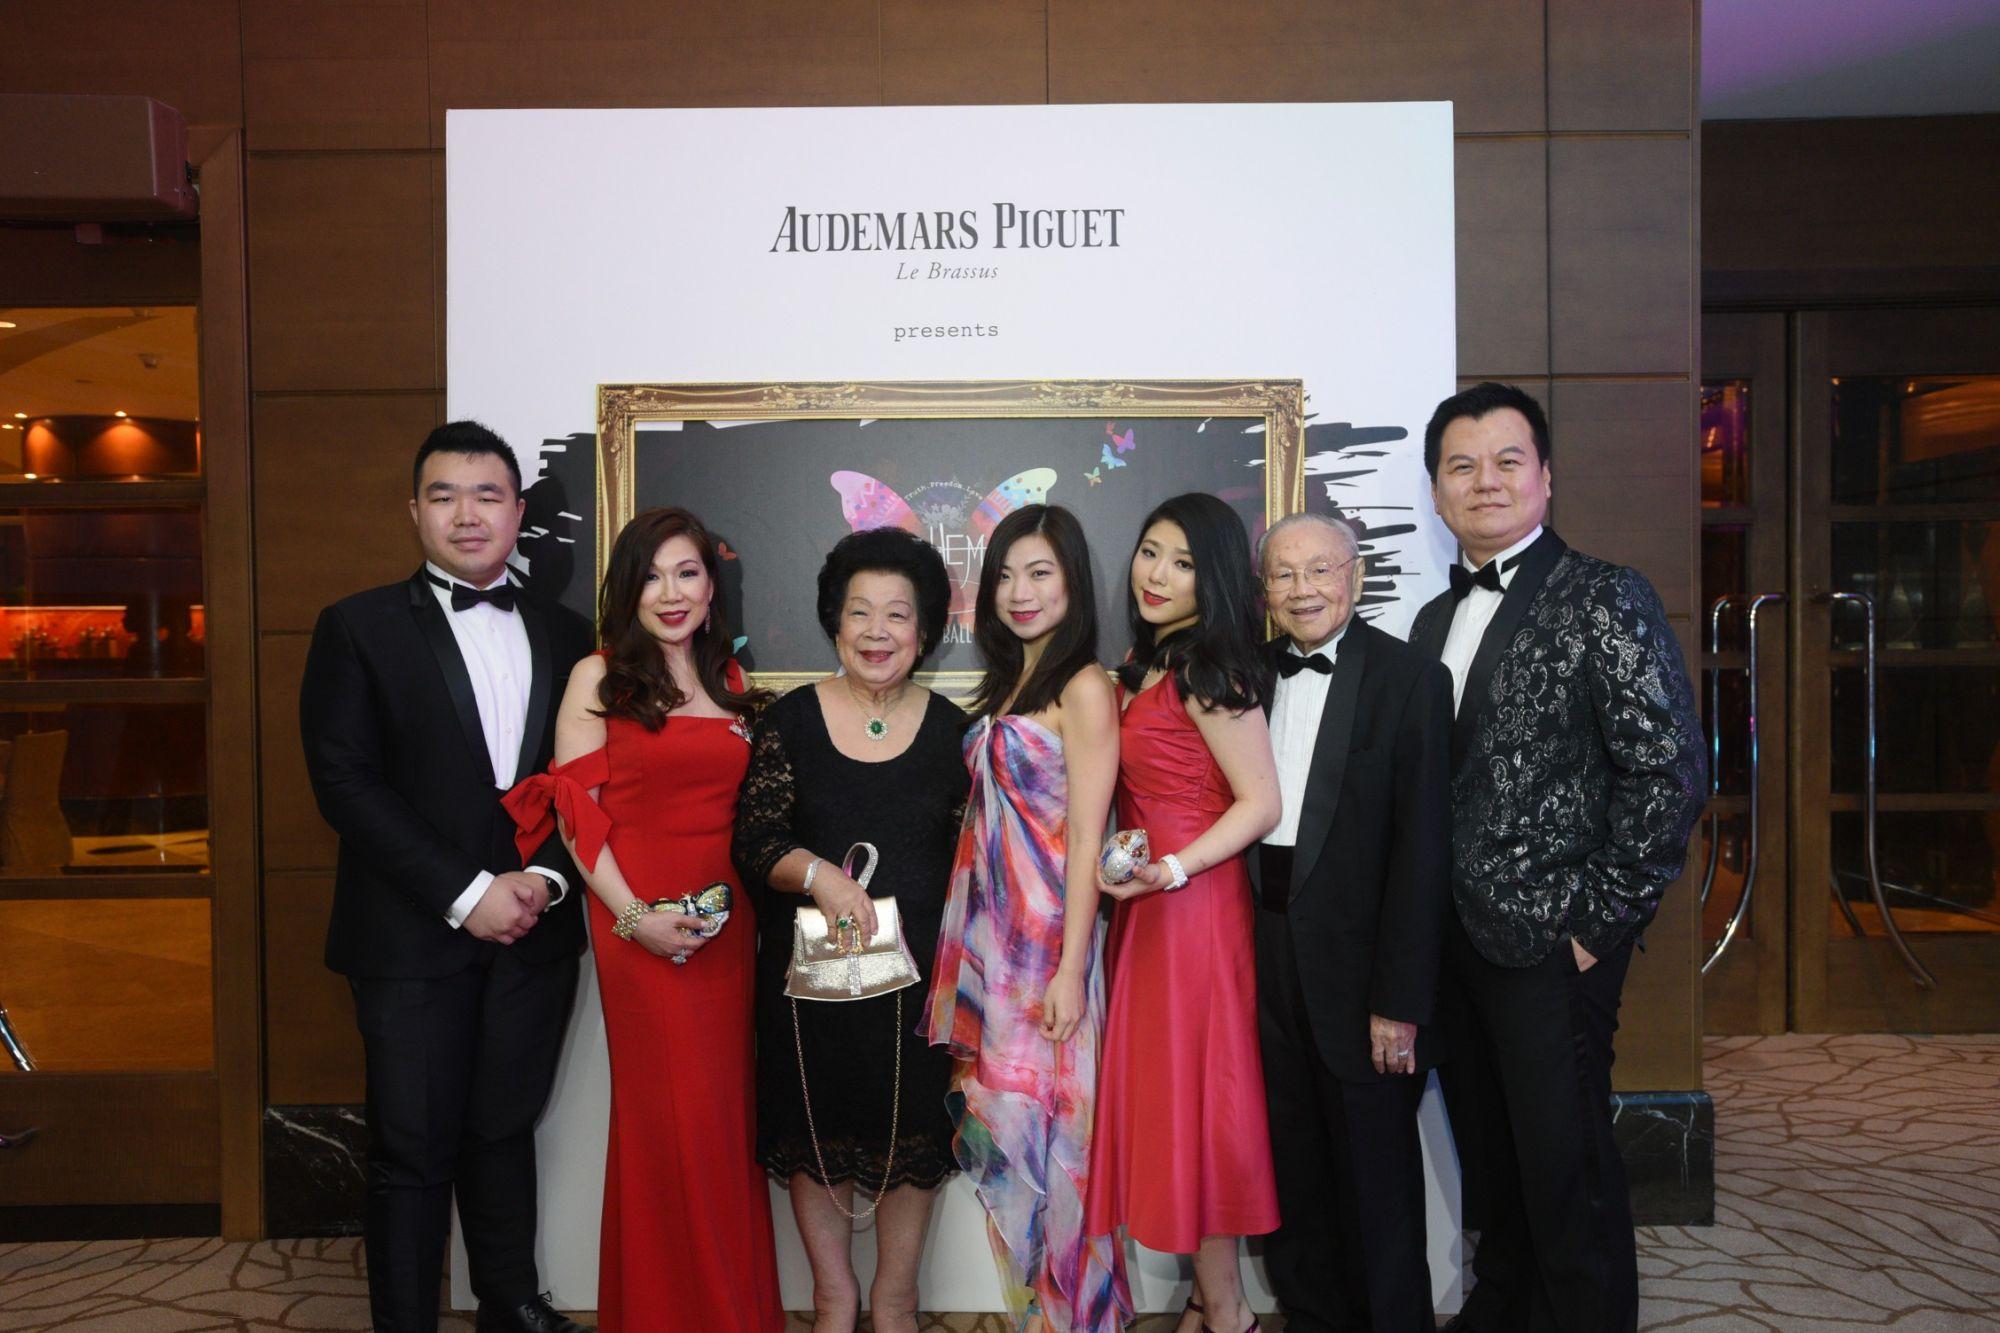 Bertrand Peh, Susan Peh, Mary Ho, Melissa Peh, Desiree Peh, Mark Leong, Adrian Peh